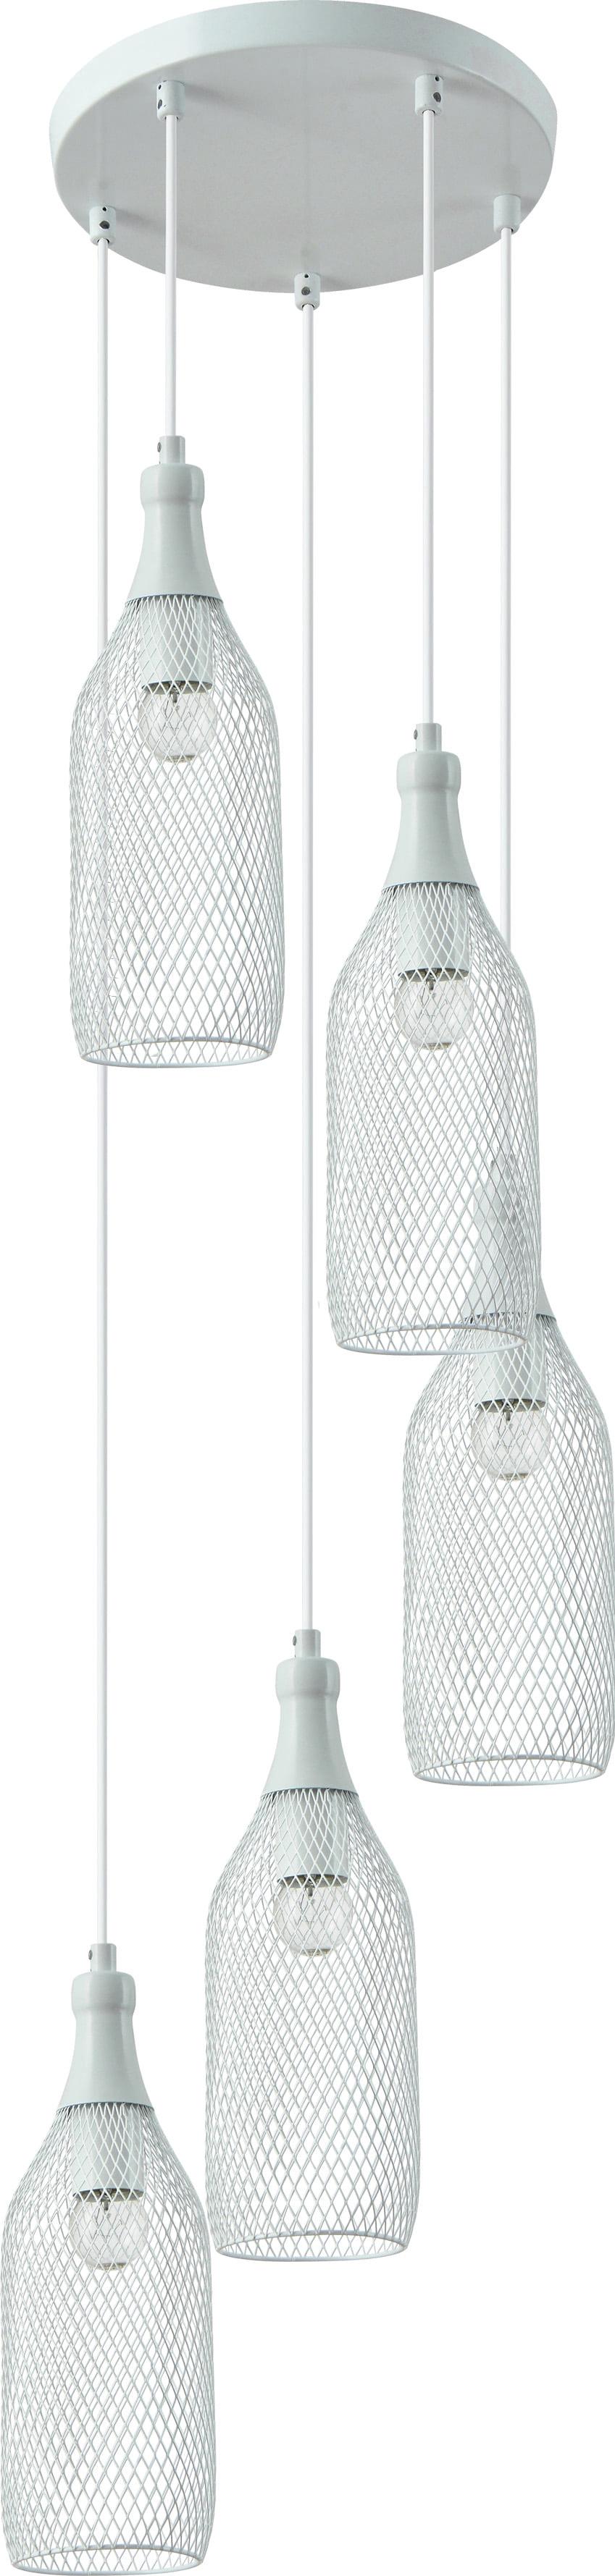 Five-point hanging lamp Barla White Grid